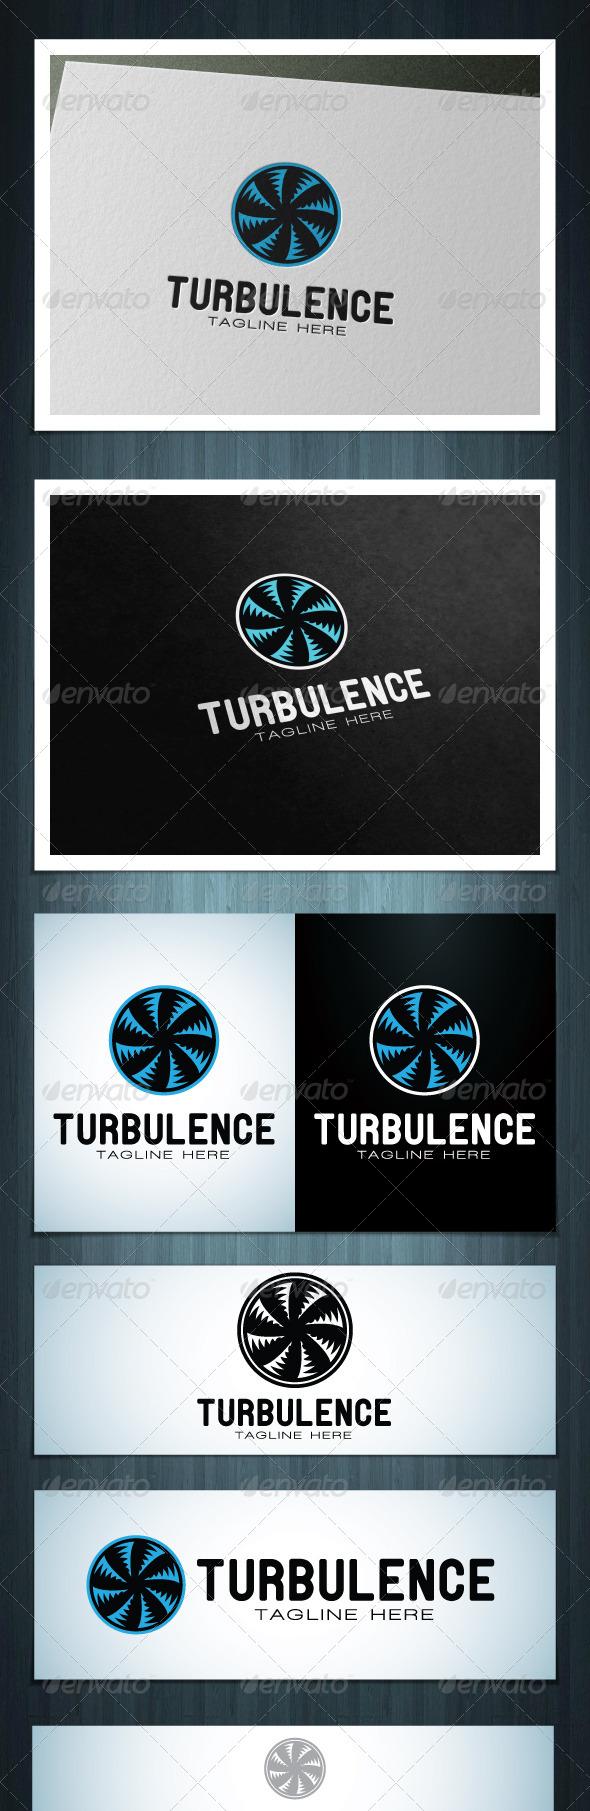 Turbulence - Vector Abstract